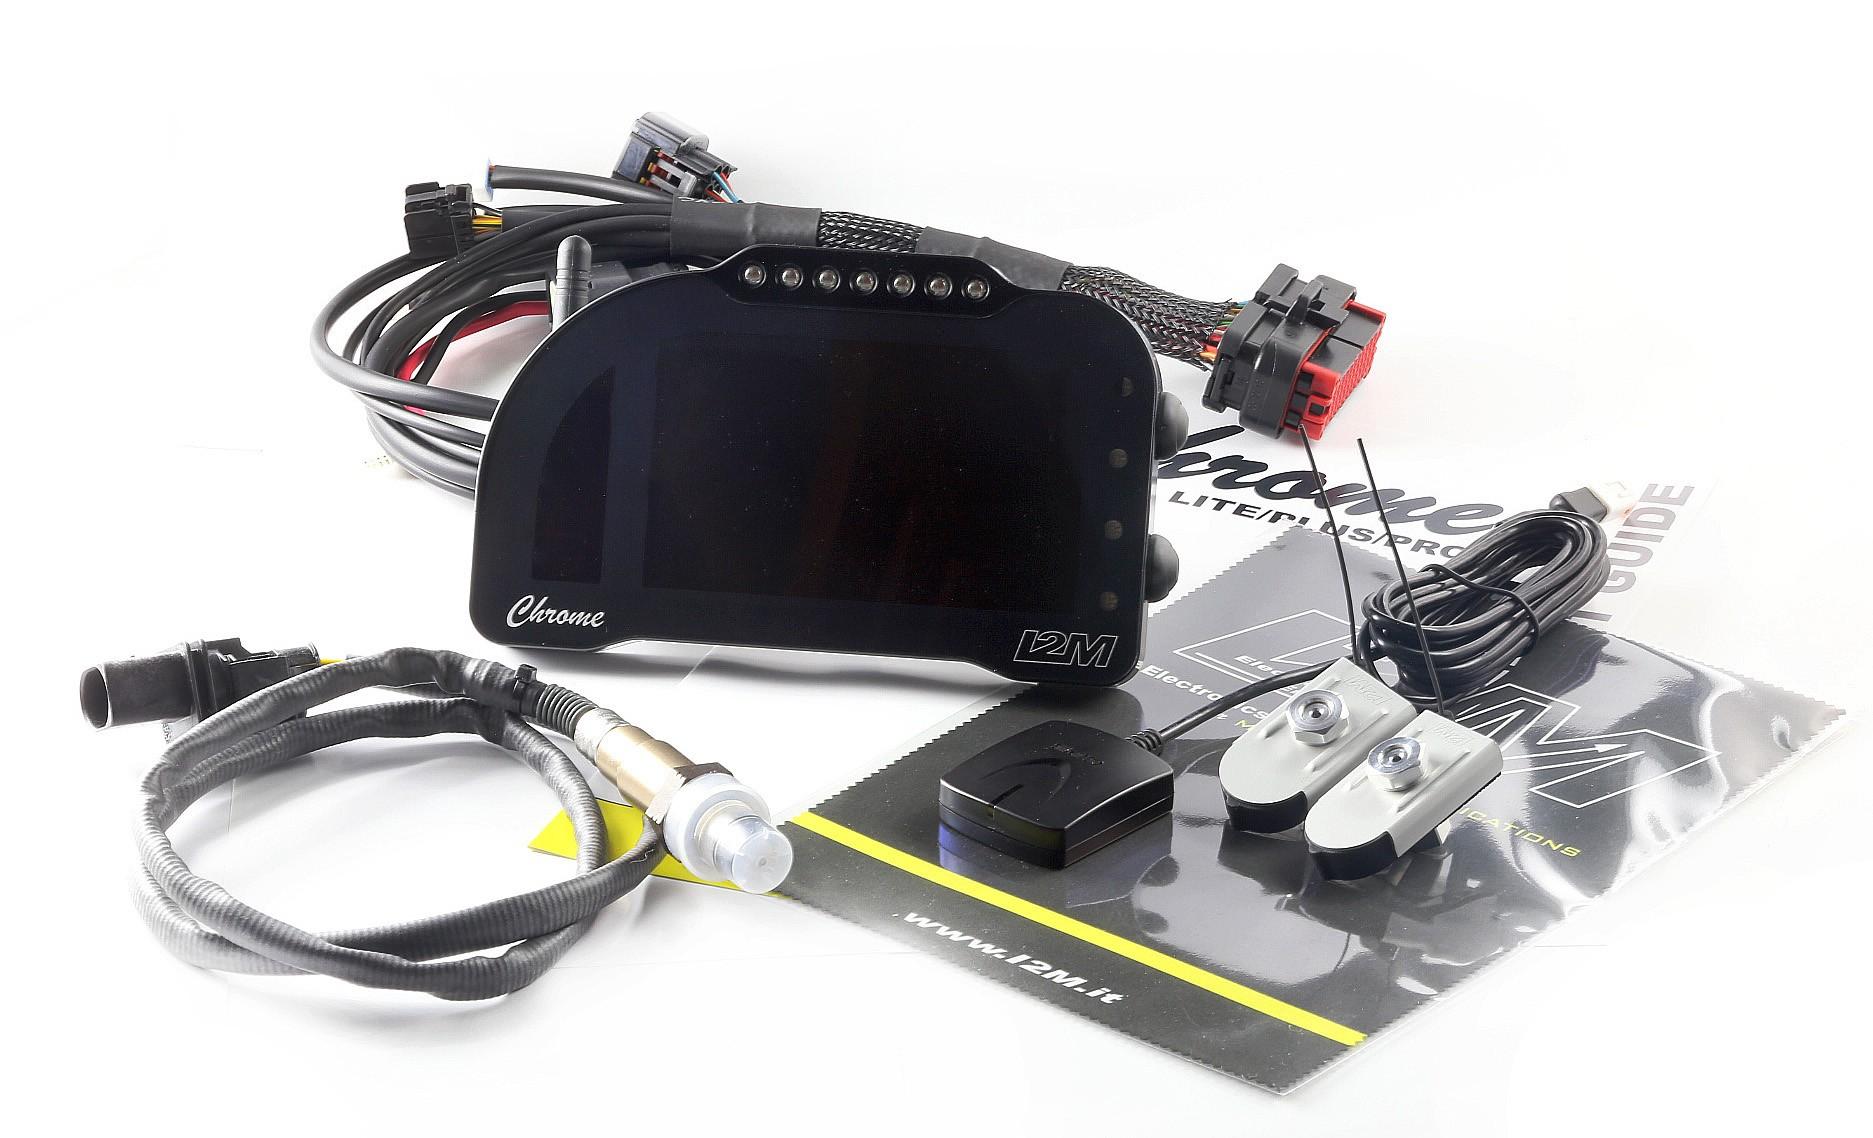 "i2M Chrome PRO2 5"" Full Color LCD Dash & GPS Lap Timer - Plug & Play -  Honda, Kawasaki, Suzuki, Yamaha, Ducati, MV Agusta, Aprilia, BMW"